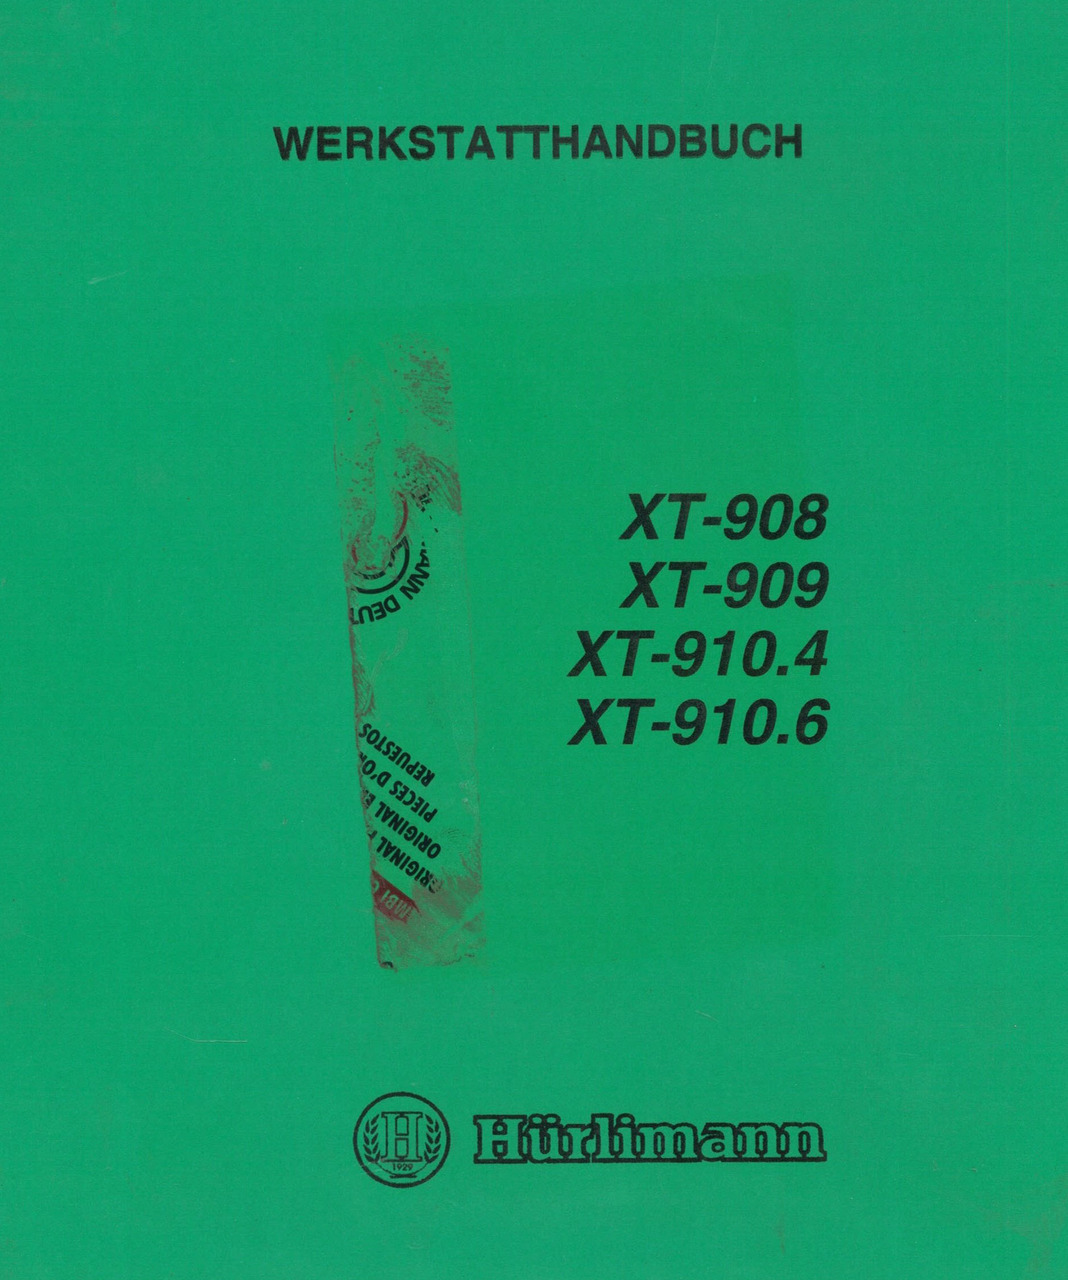 XT 908 - 909 - 910.4 - 910.6 - Werkstatthandbuch